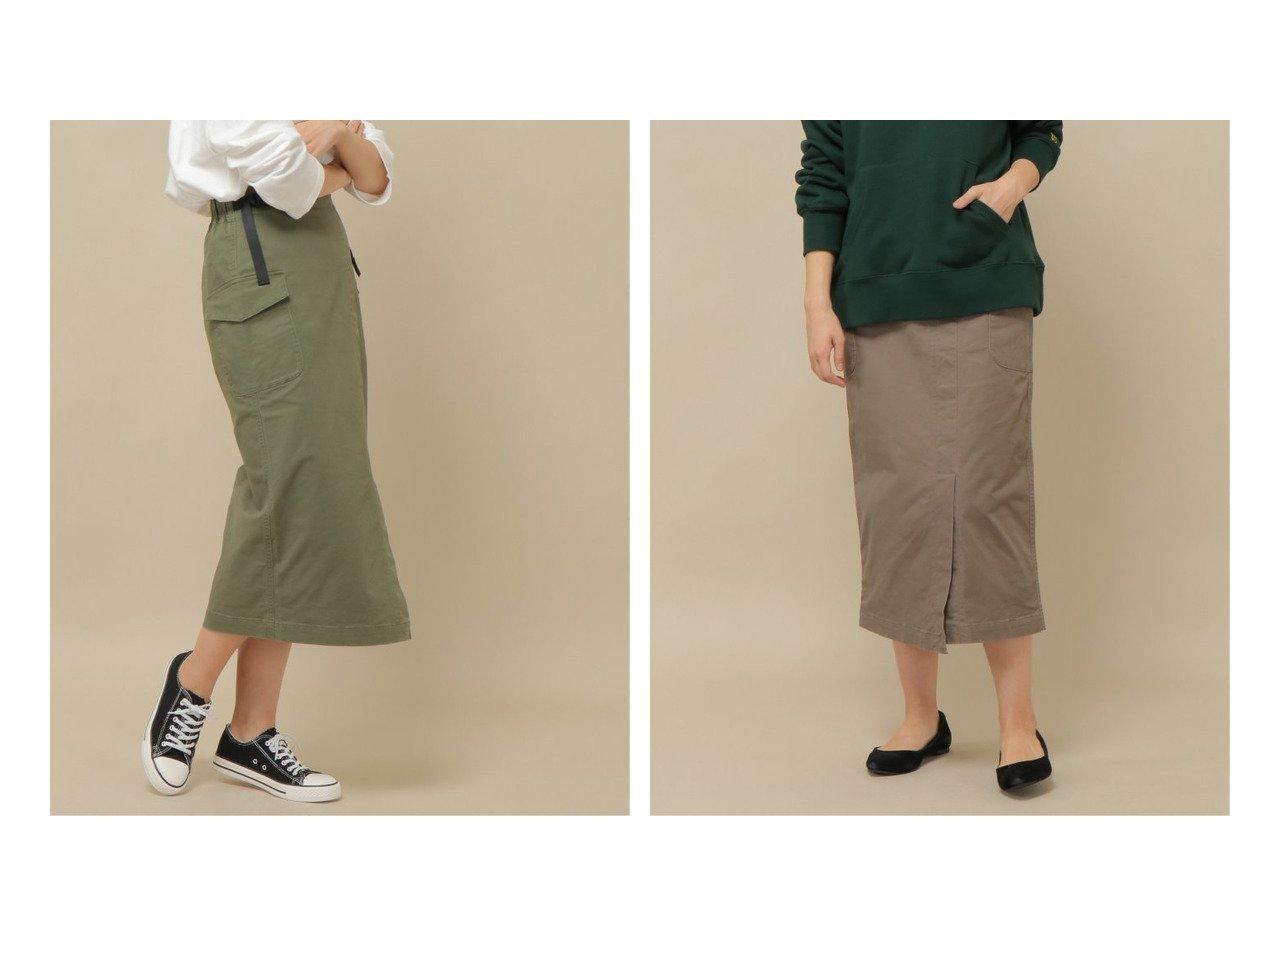 【ikka/イッカ】の【グラミチ】GURKHA SKIRT ikkaのおすすめ!人気、トレンド・レディースファッションの通販 おすすめで人気の流行・トレンド、ファッションの通販商品 メンズファッション・キッズファッション・インテリア・家具・レディースファッション・服の通販 founy(ファニー) https://founy.com/ ファッション Fashion レディースファッション WOMEN スカート Skirt カリフォルニア ストーン スリット センター タイツ タイトスカート 定番 Standard バランス 再入荷 Restock/Back in Stock/Re Arrival |ID:crp329100000018937